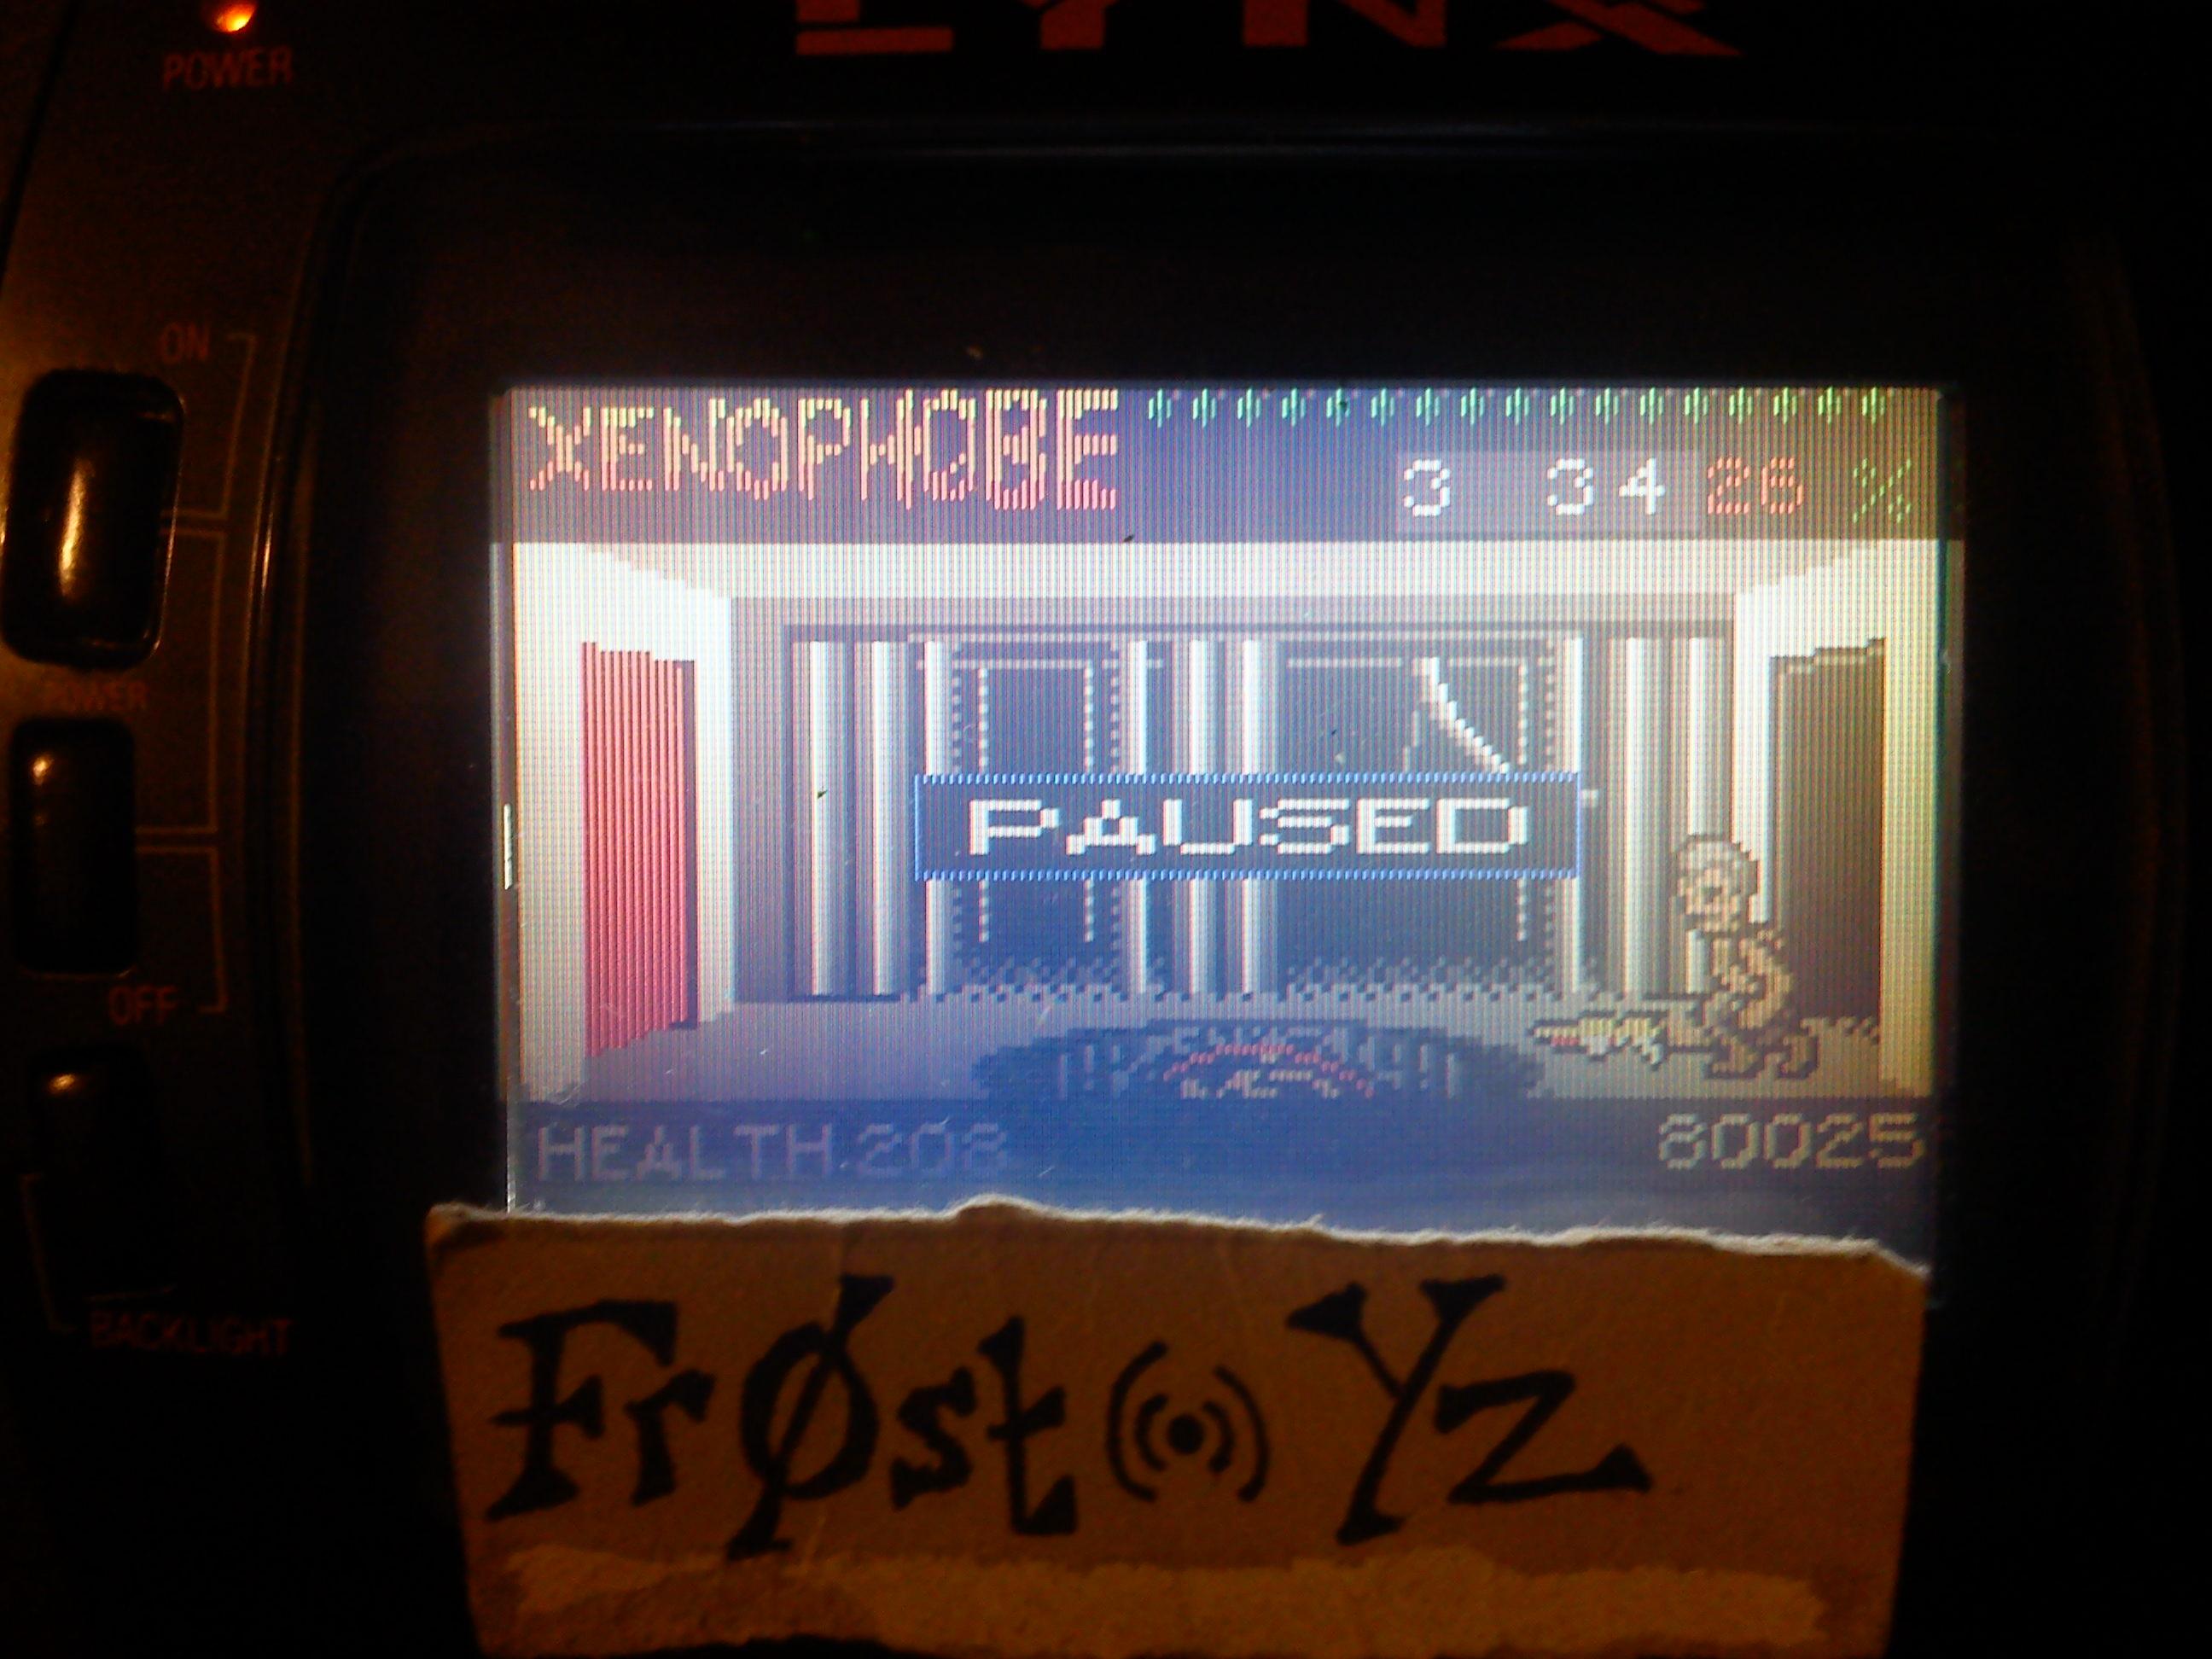 Fr0st: Xenophobe (Atari Lynx) 80,025 points on 2014-11-05 13:58:15